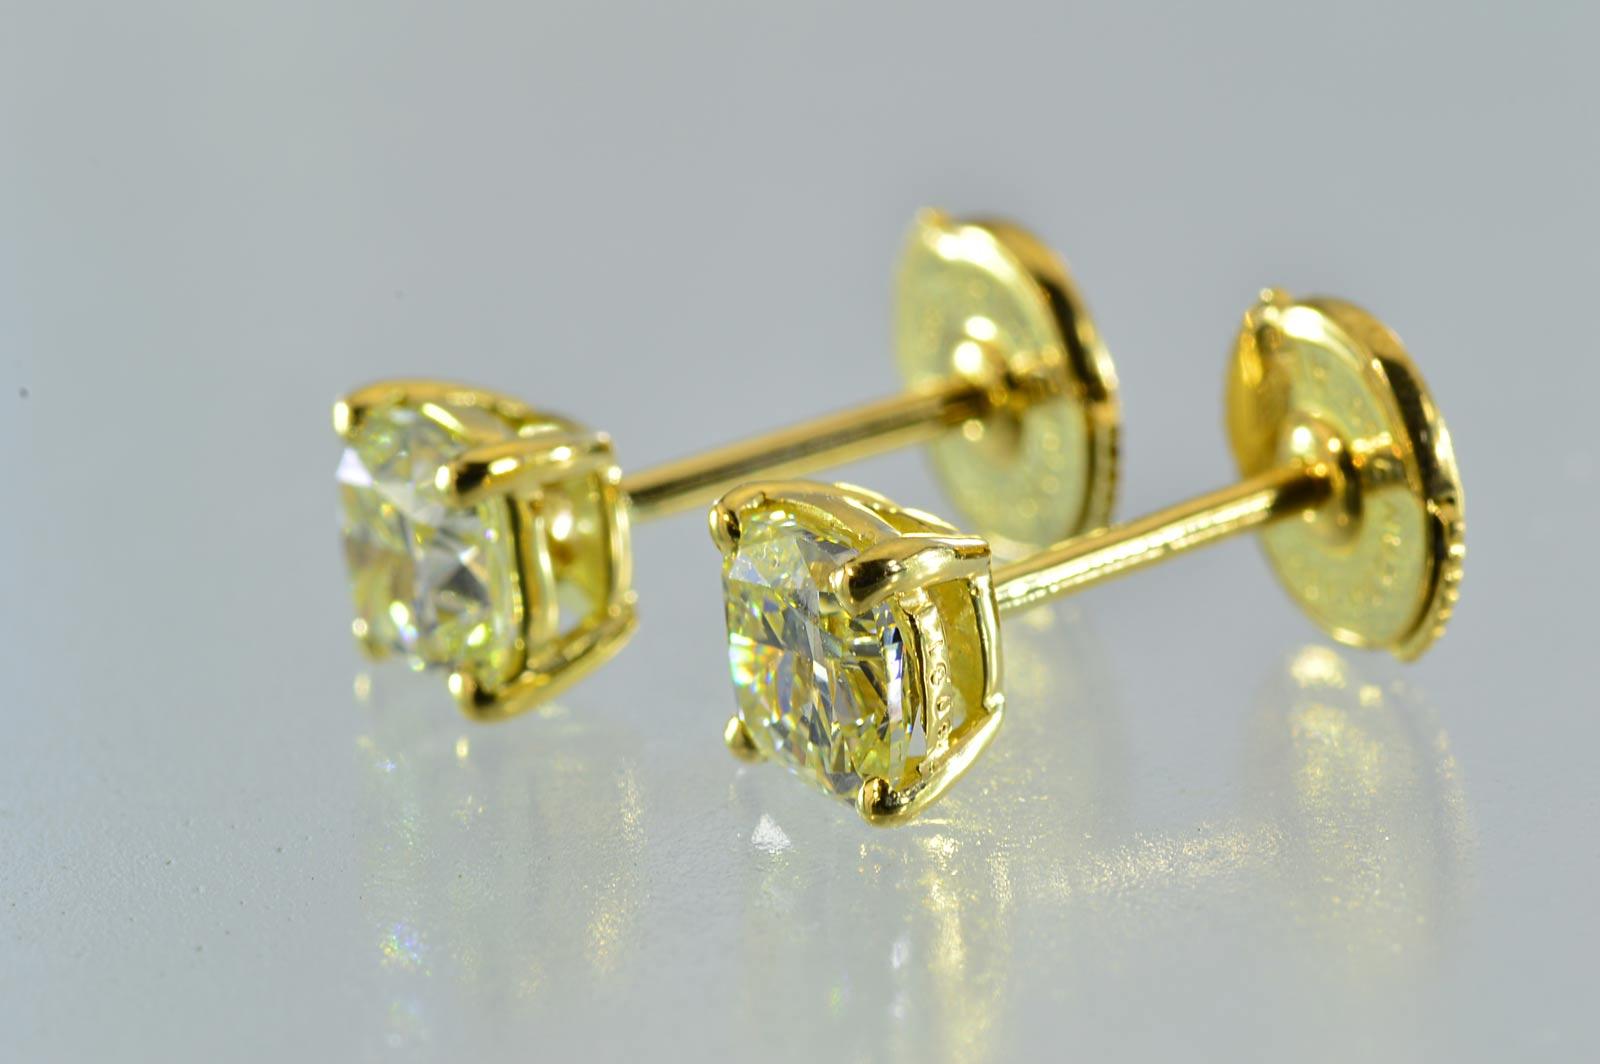 Very Por One 1 Carat Diamond Earrings Cushion Cut M Color Vvs Hannari Lemon Yellow Is Yg Gently Sparkling